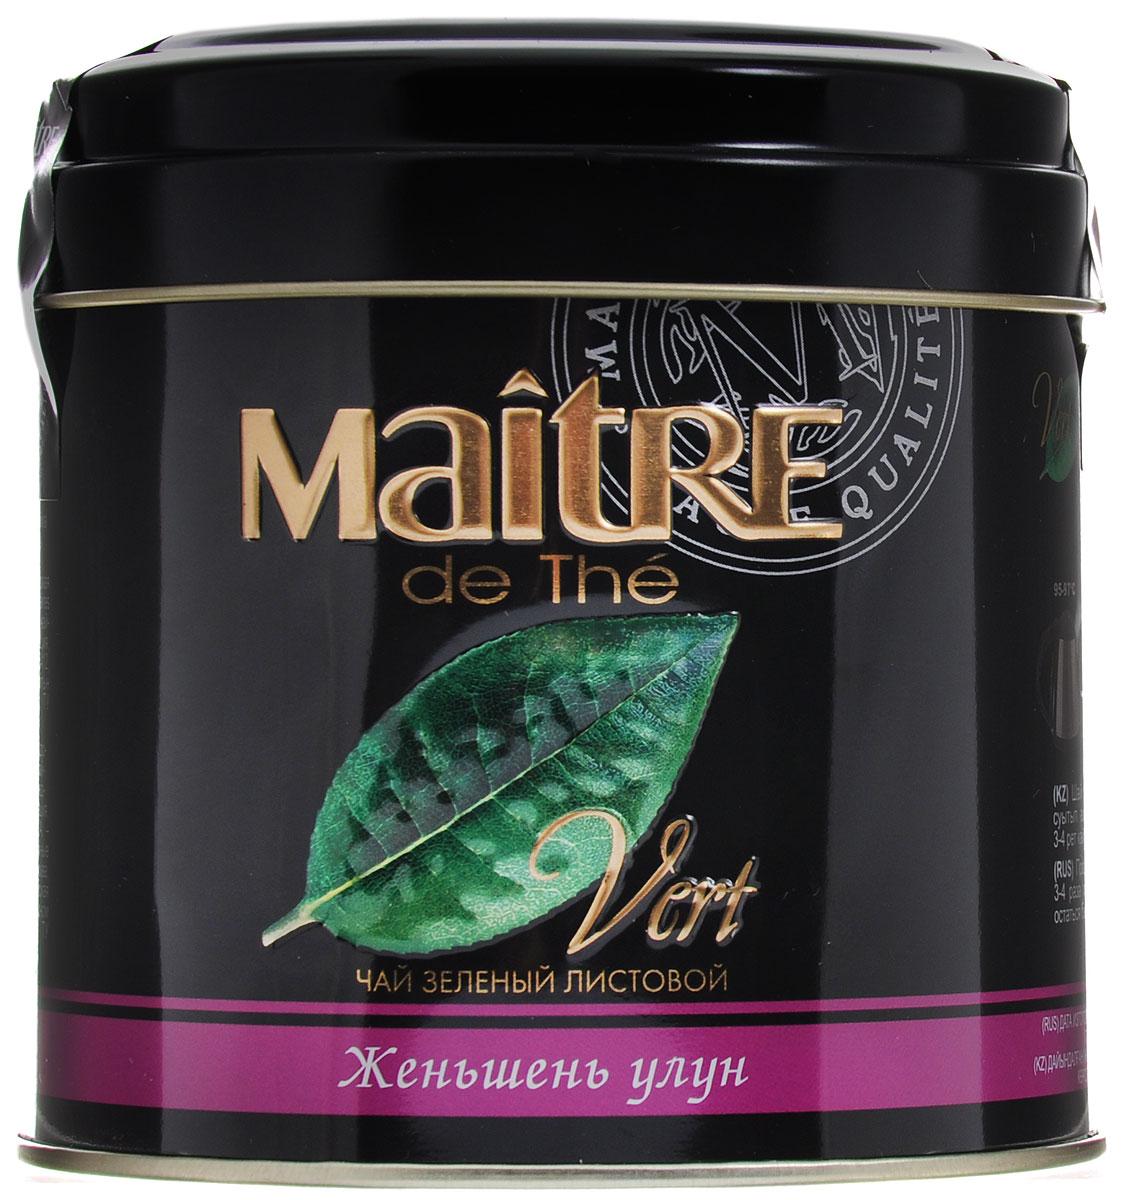 Maitre de The Женьшень улун зеленый листовой чай, 150 г (жестяная банка) бар070р